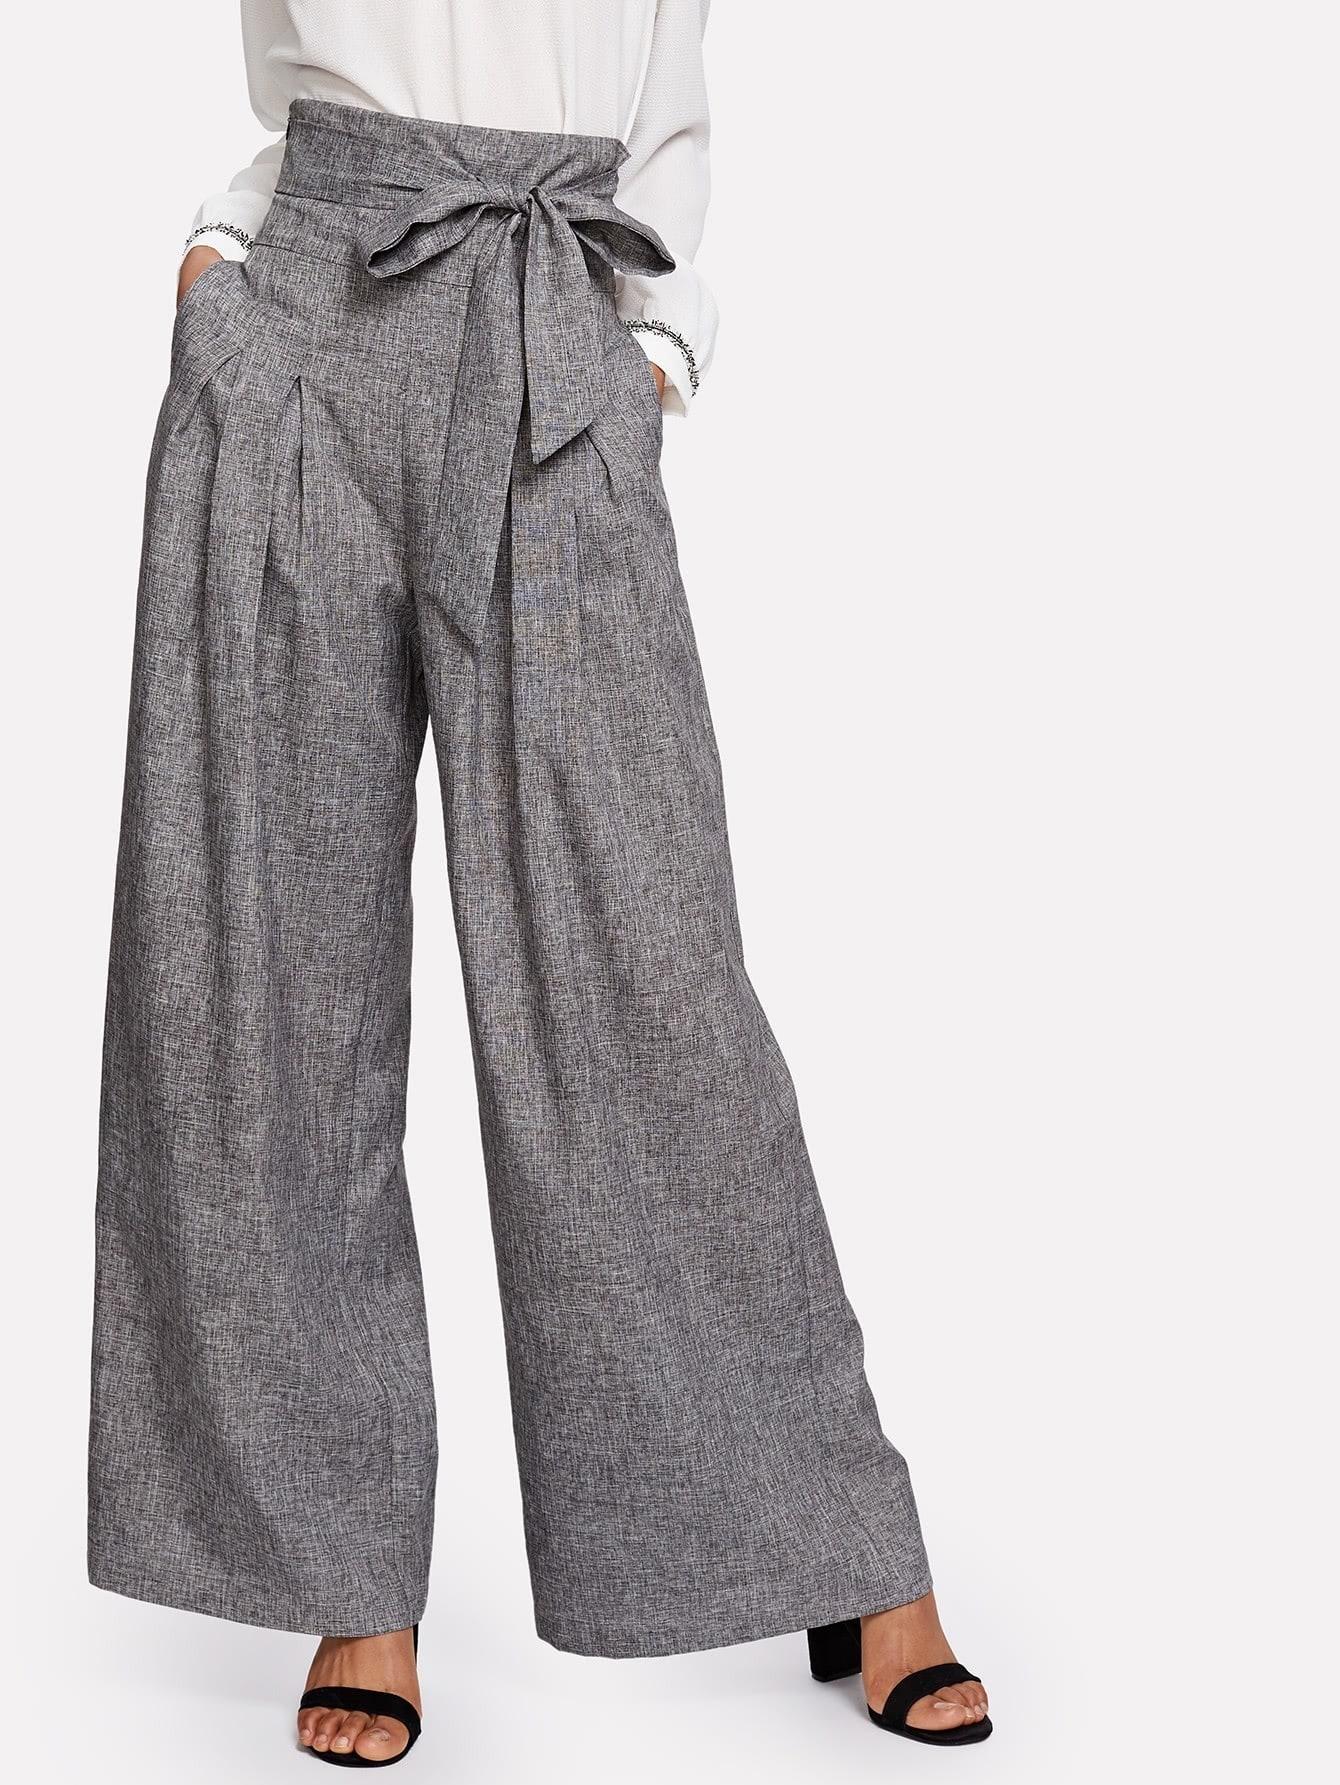 Self Belted Box Pleated Palazzo Pants self belted skirt palazzo pants